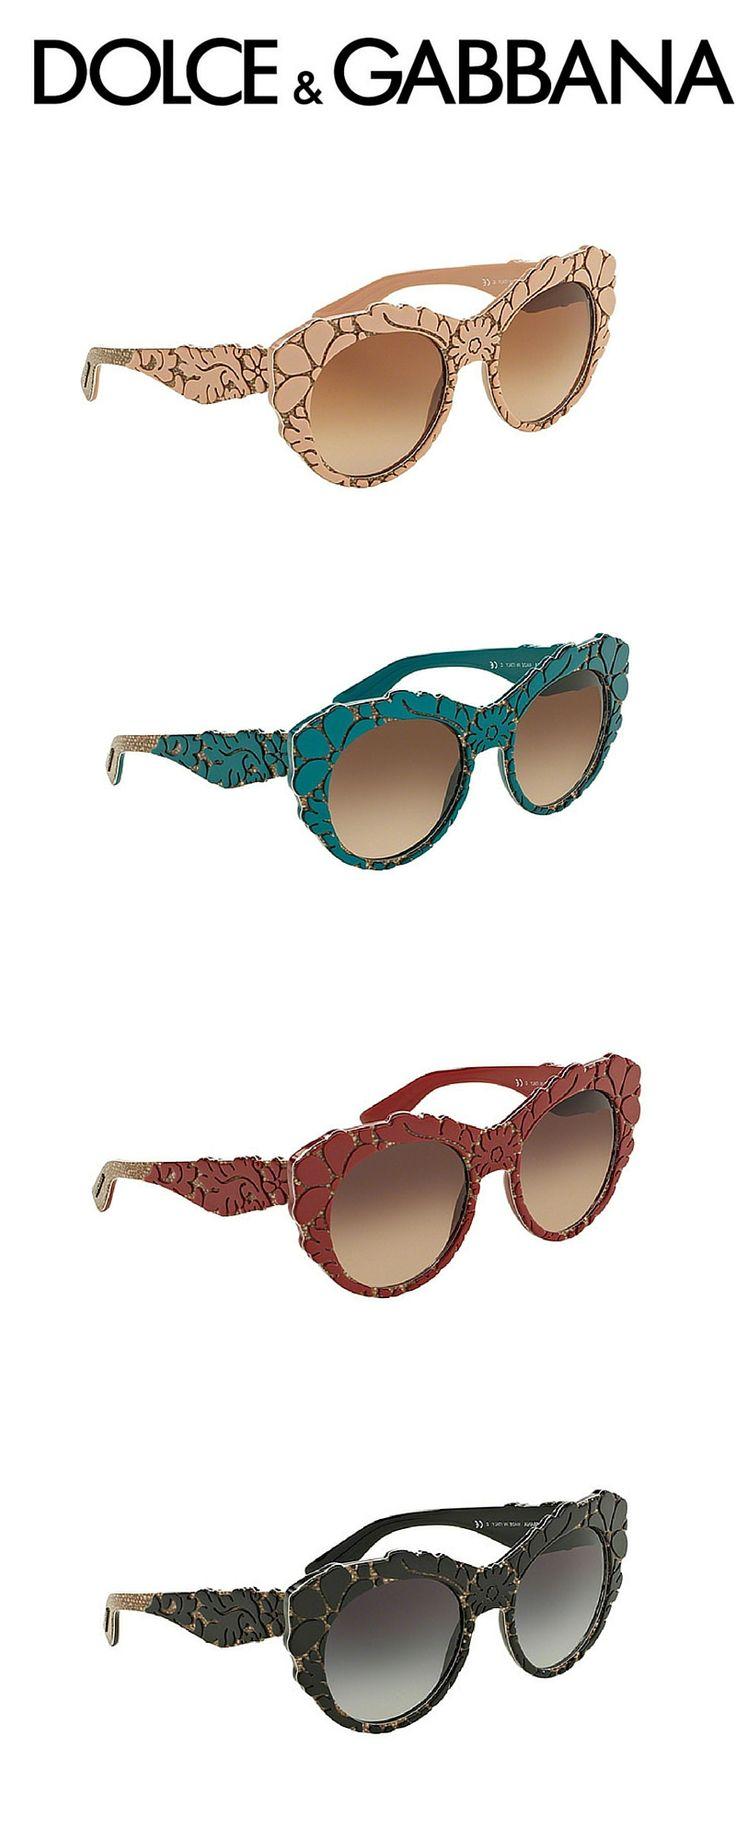 D&G glamorous style! http://www.smartbuyglasses.com/designer-sunglasses/Dolce-&-Gabbana/Dolce-&-Gabbana-DG4267-Mamas-Brocade-299913-294698.html